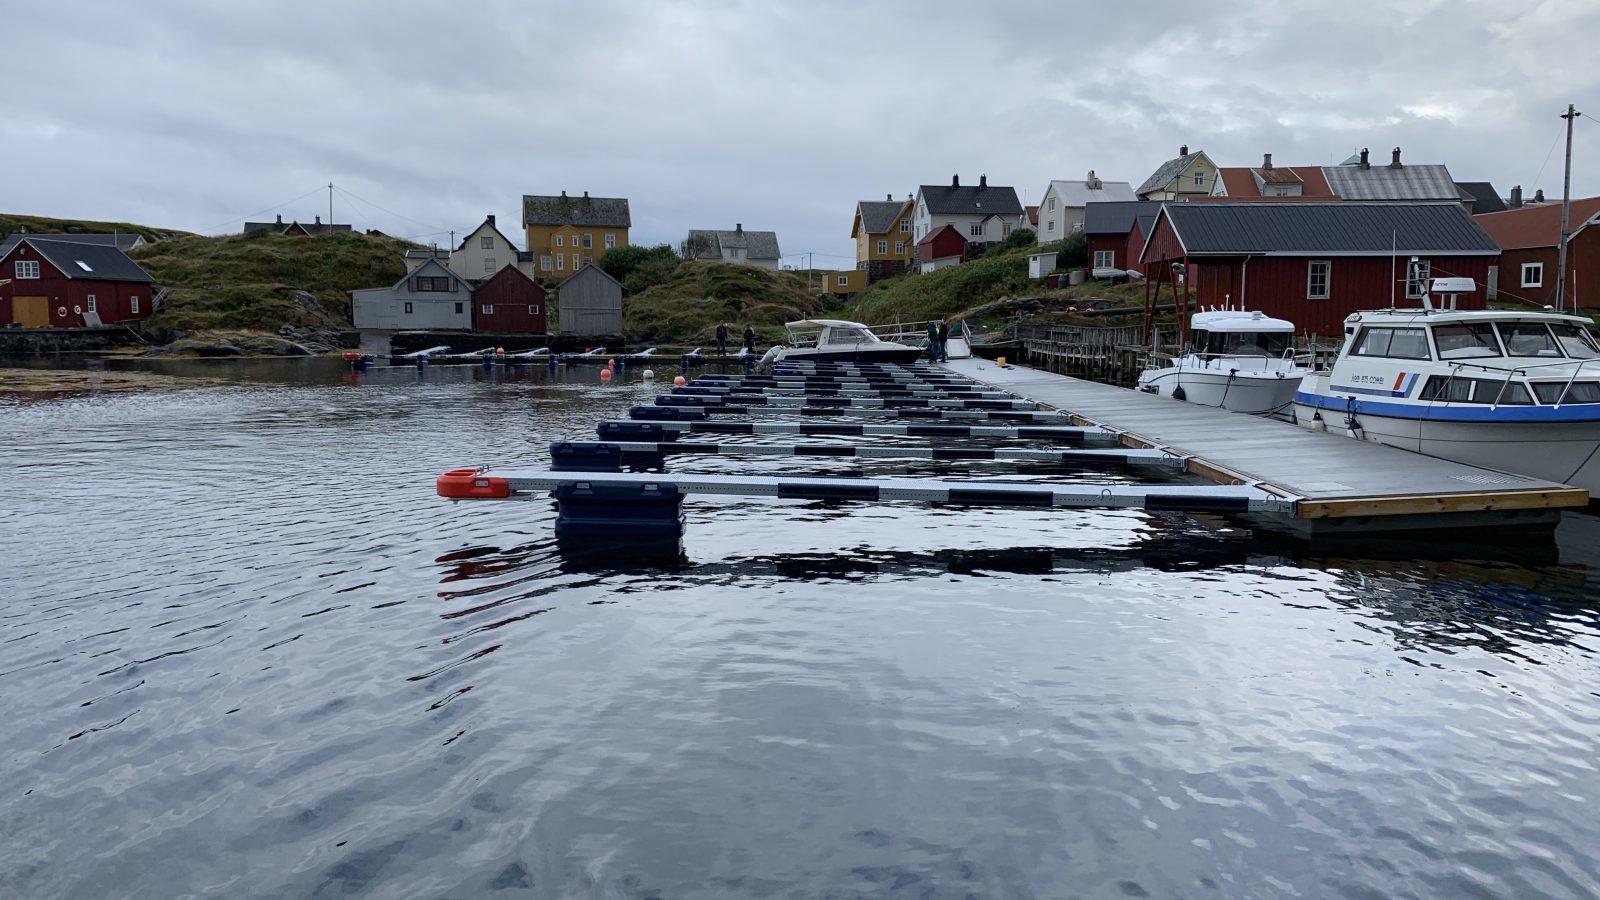 https://www.marinasolutions.no/uploads/Hamnaberget-småbåtforening-nordre-bjørnsund-marina-solutions-betongbrygger-sklisikre-utriggere-10.jpg